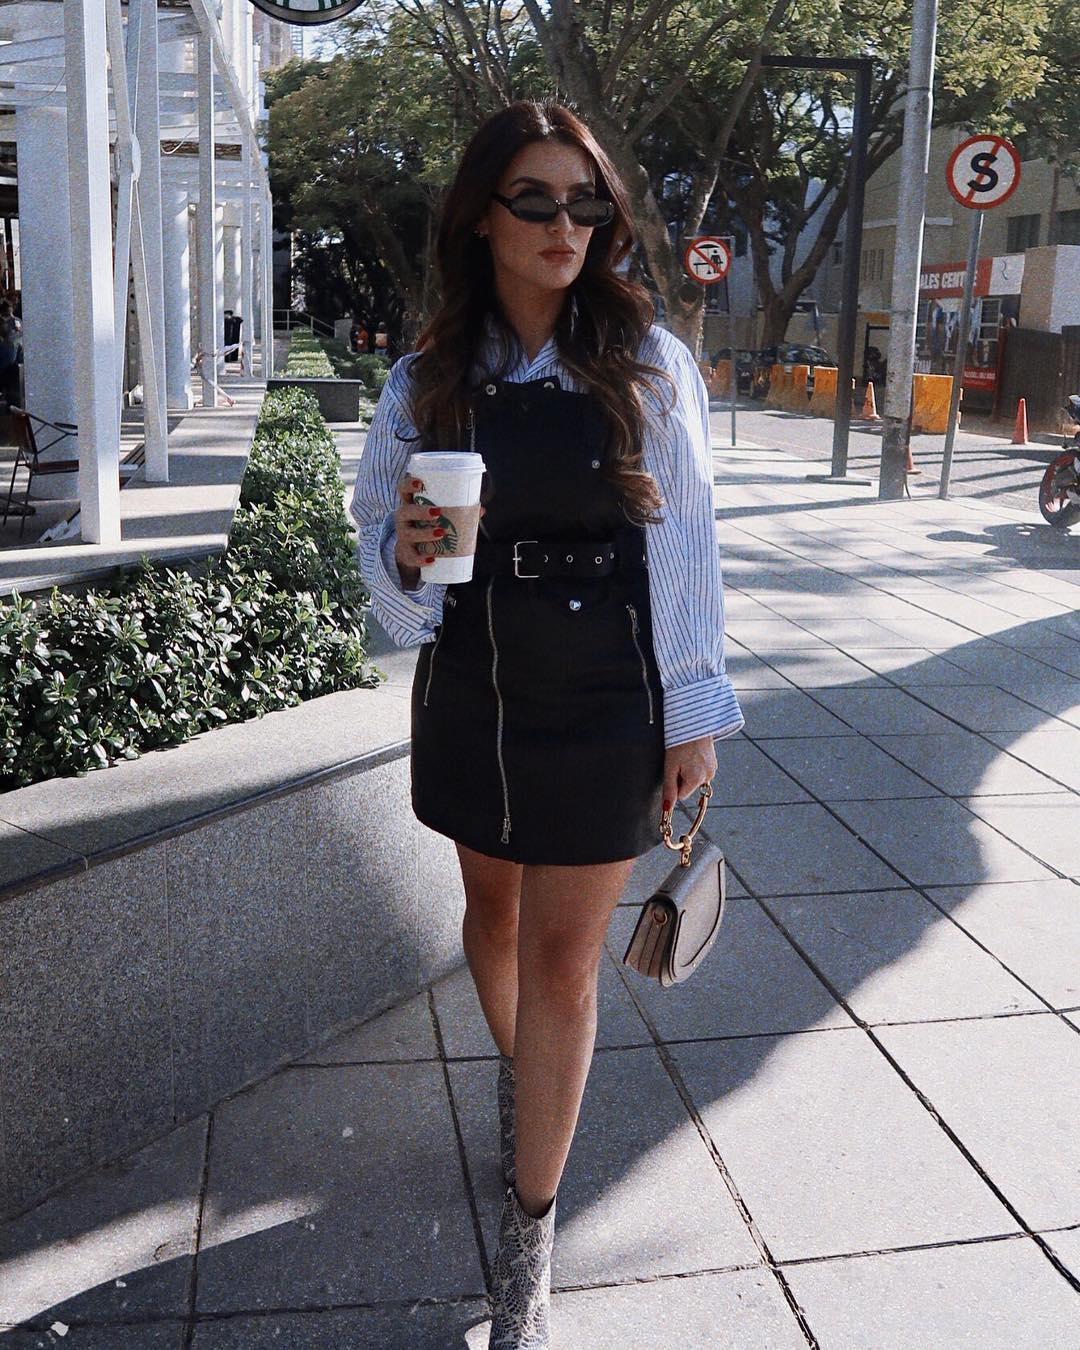 Black biker style zip dress and oversized striped white shirt combo 2021